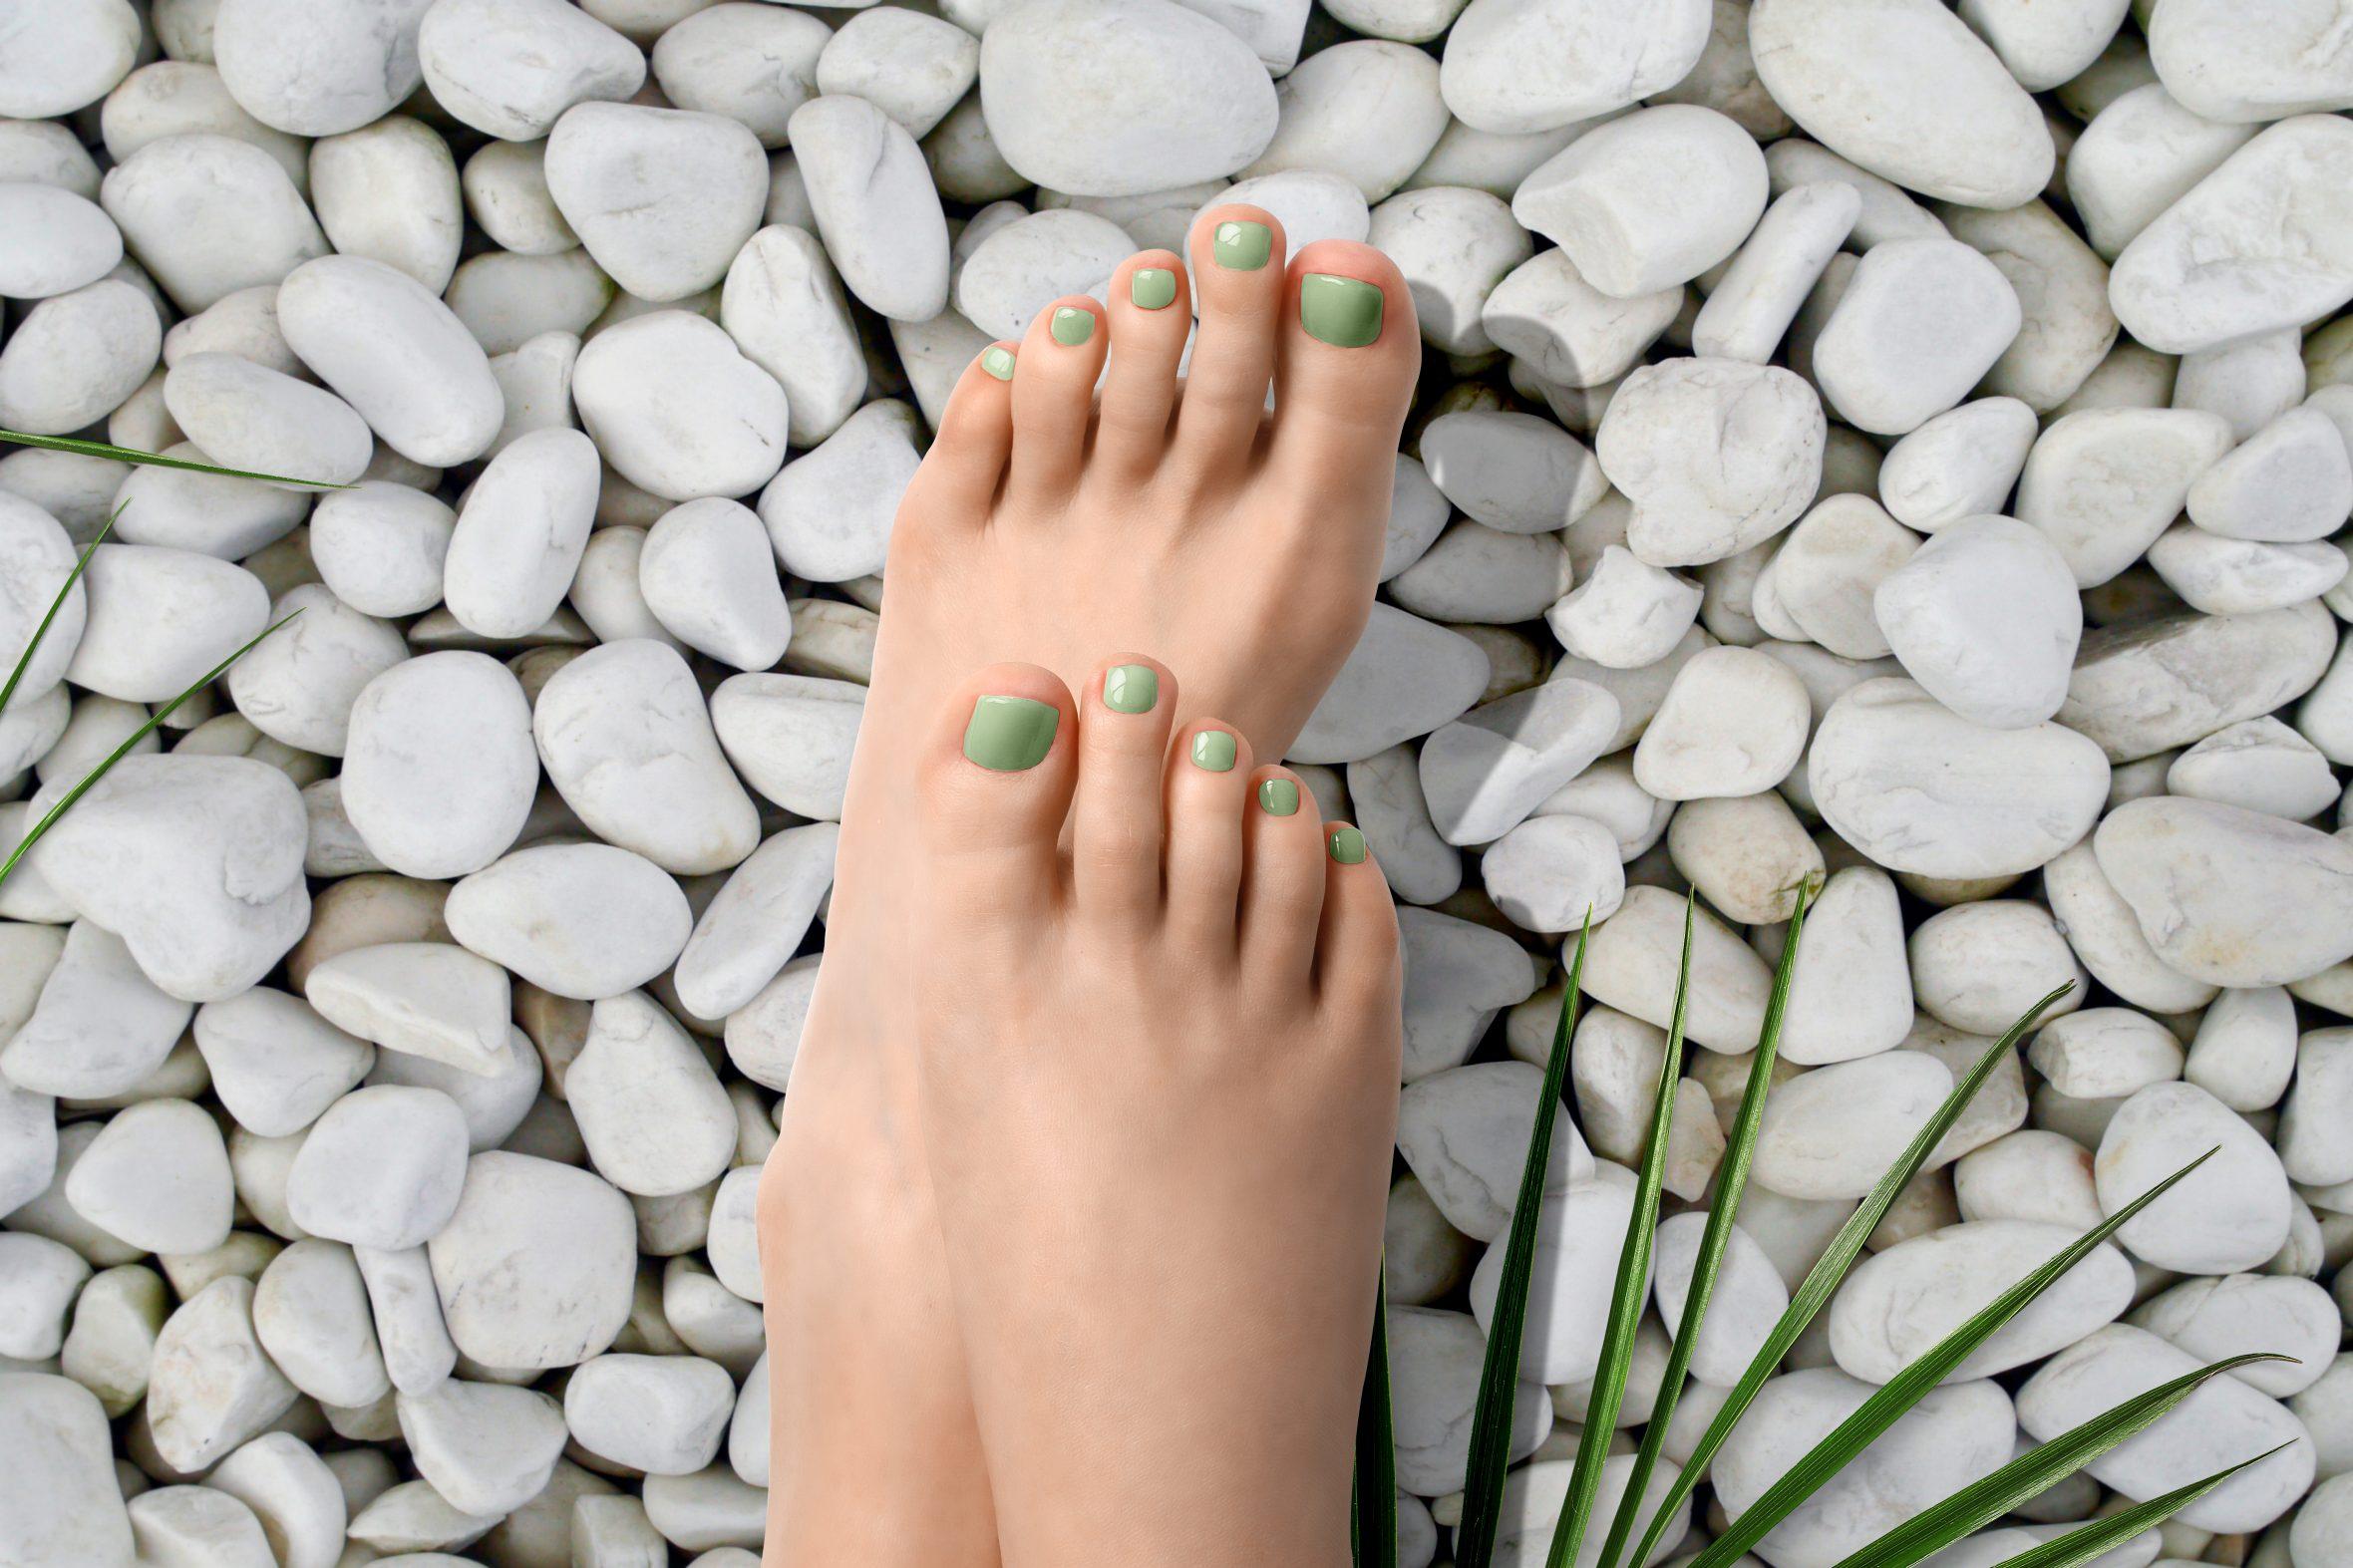 pistache groene nagellak kleurnummer 167 van de Herôme nagellak kleuren